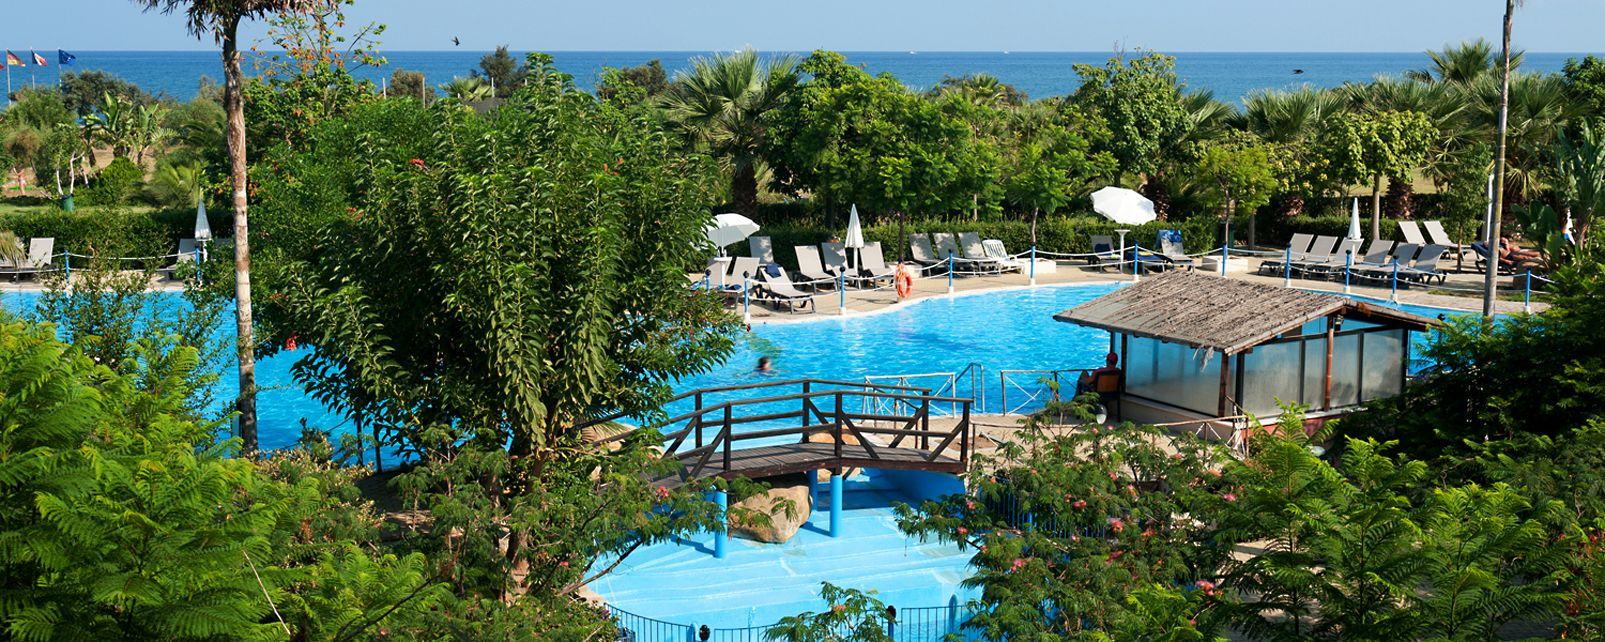 Fiesta Garden Beach Hotel Resort